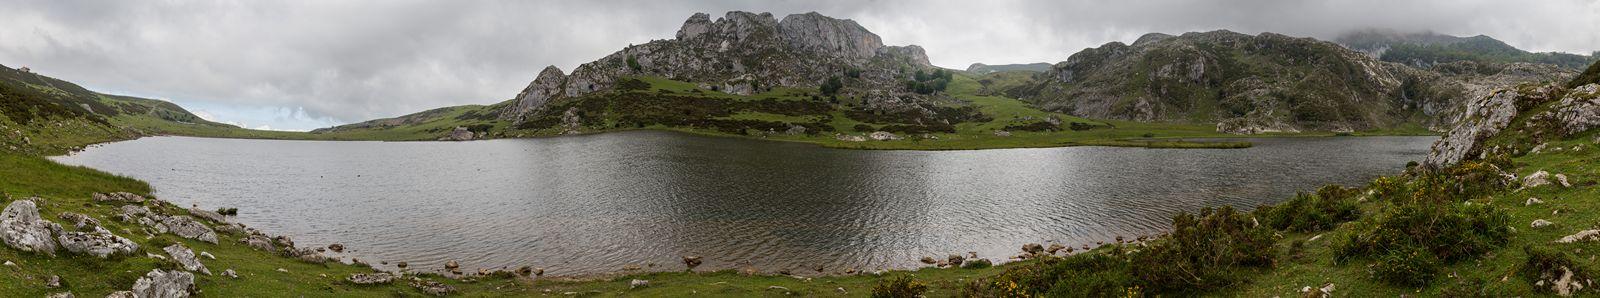 Pasando junto al Lago Ercina